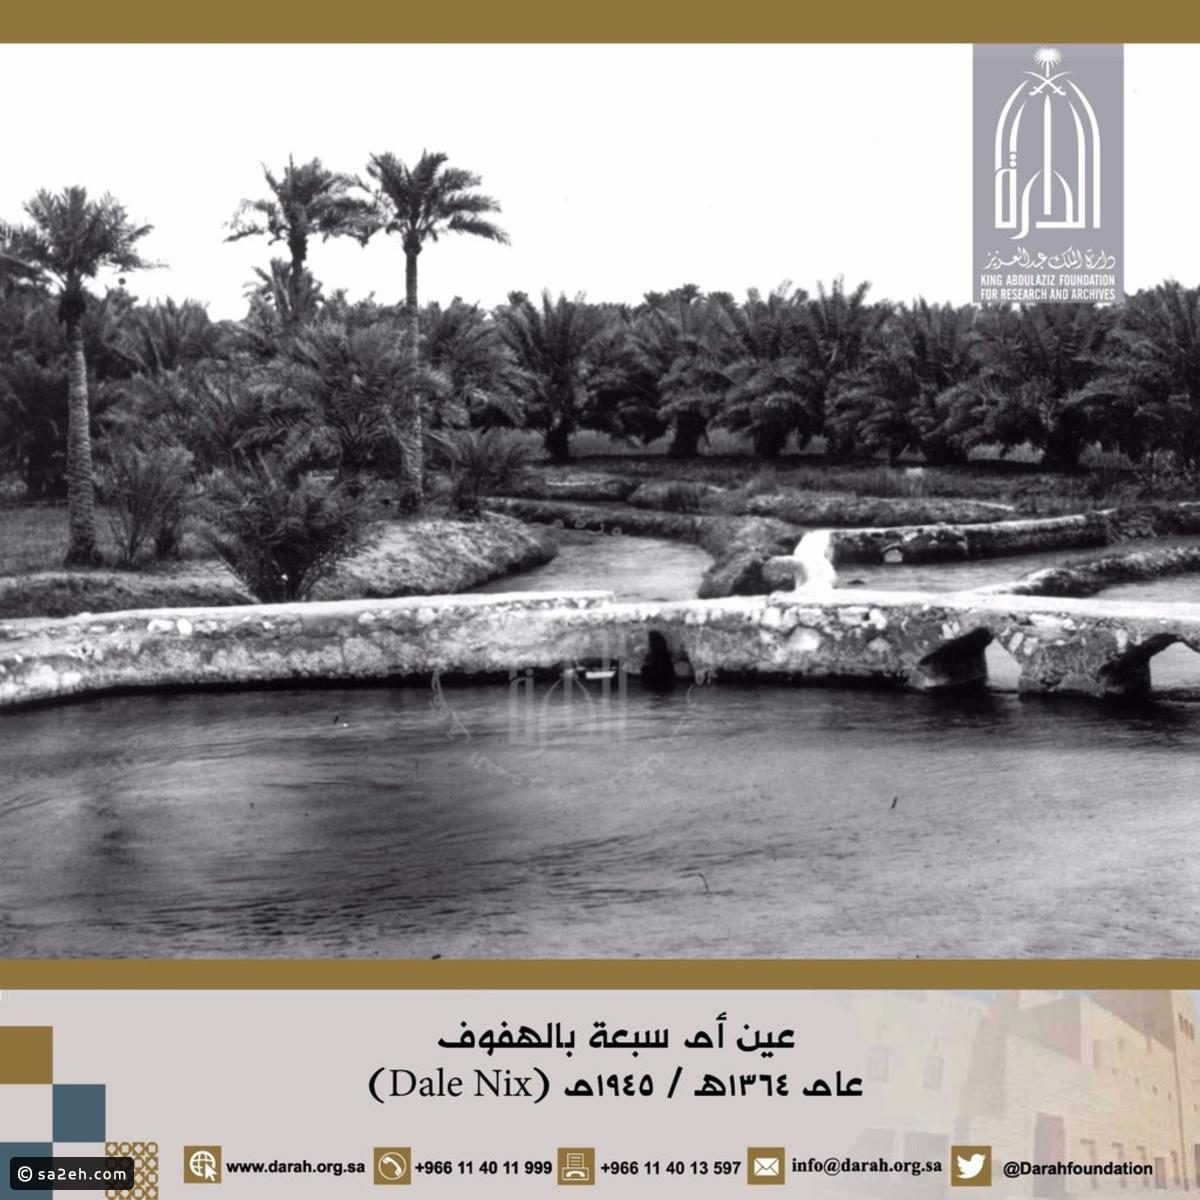 awww.alqiyady.com_site_images_sites_default_files_alqiyady_pro4d33e0786235d59d608cb9dc75fbeee4.